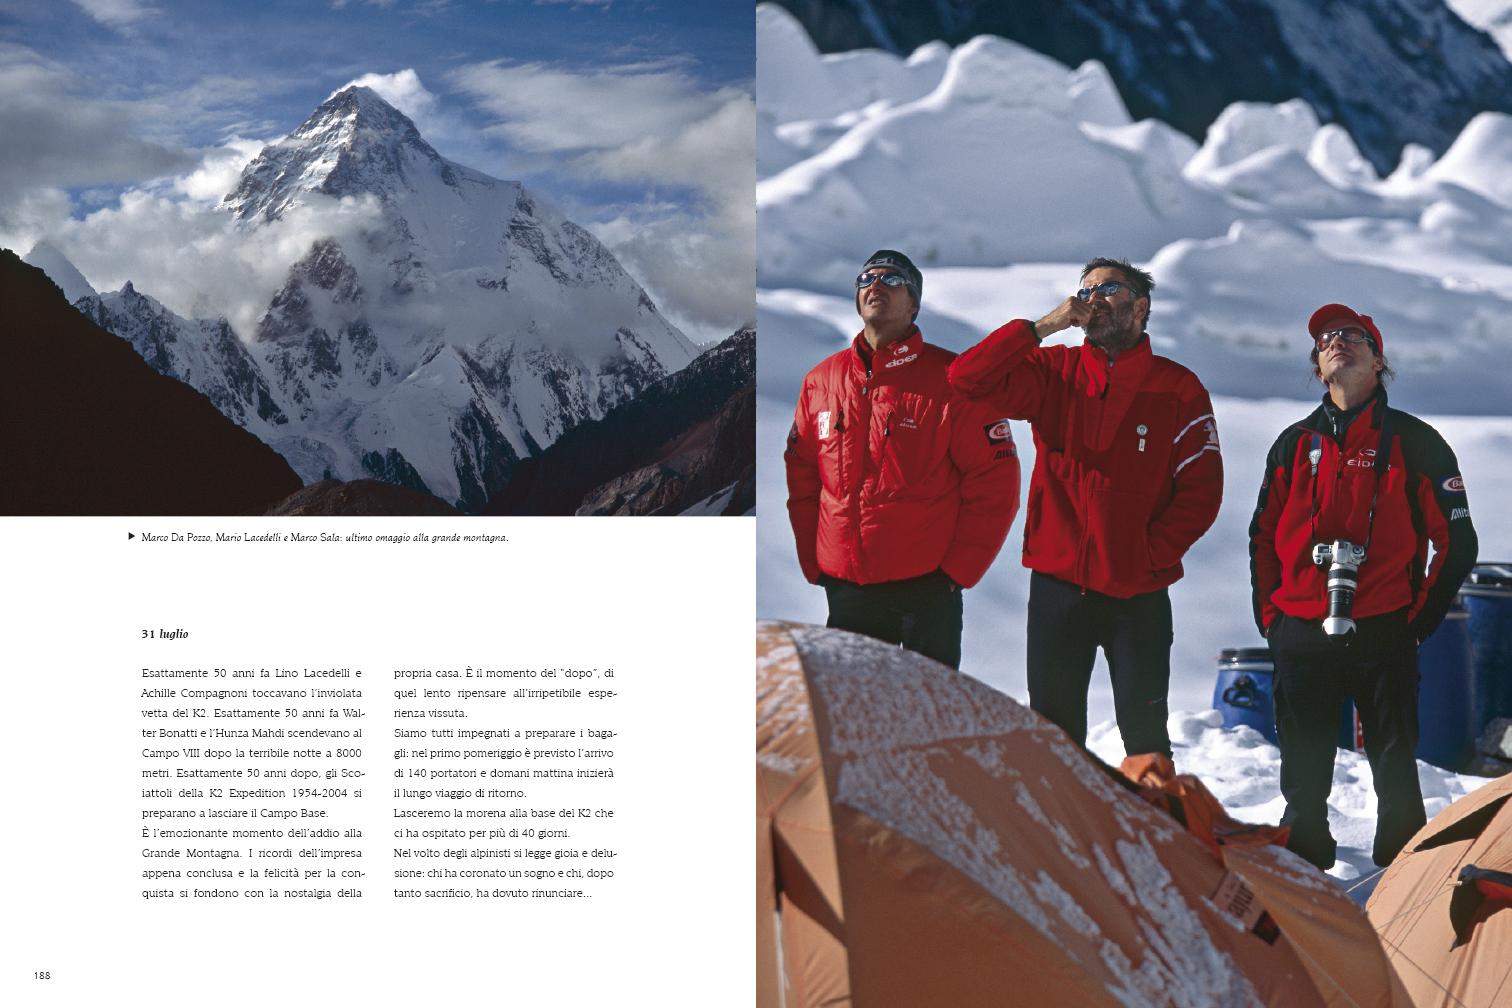 K2 EXPEDITION 1954-2004 Giuseppe Ghedina Fotografo - 096.jpg